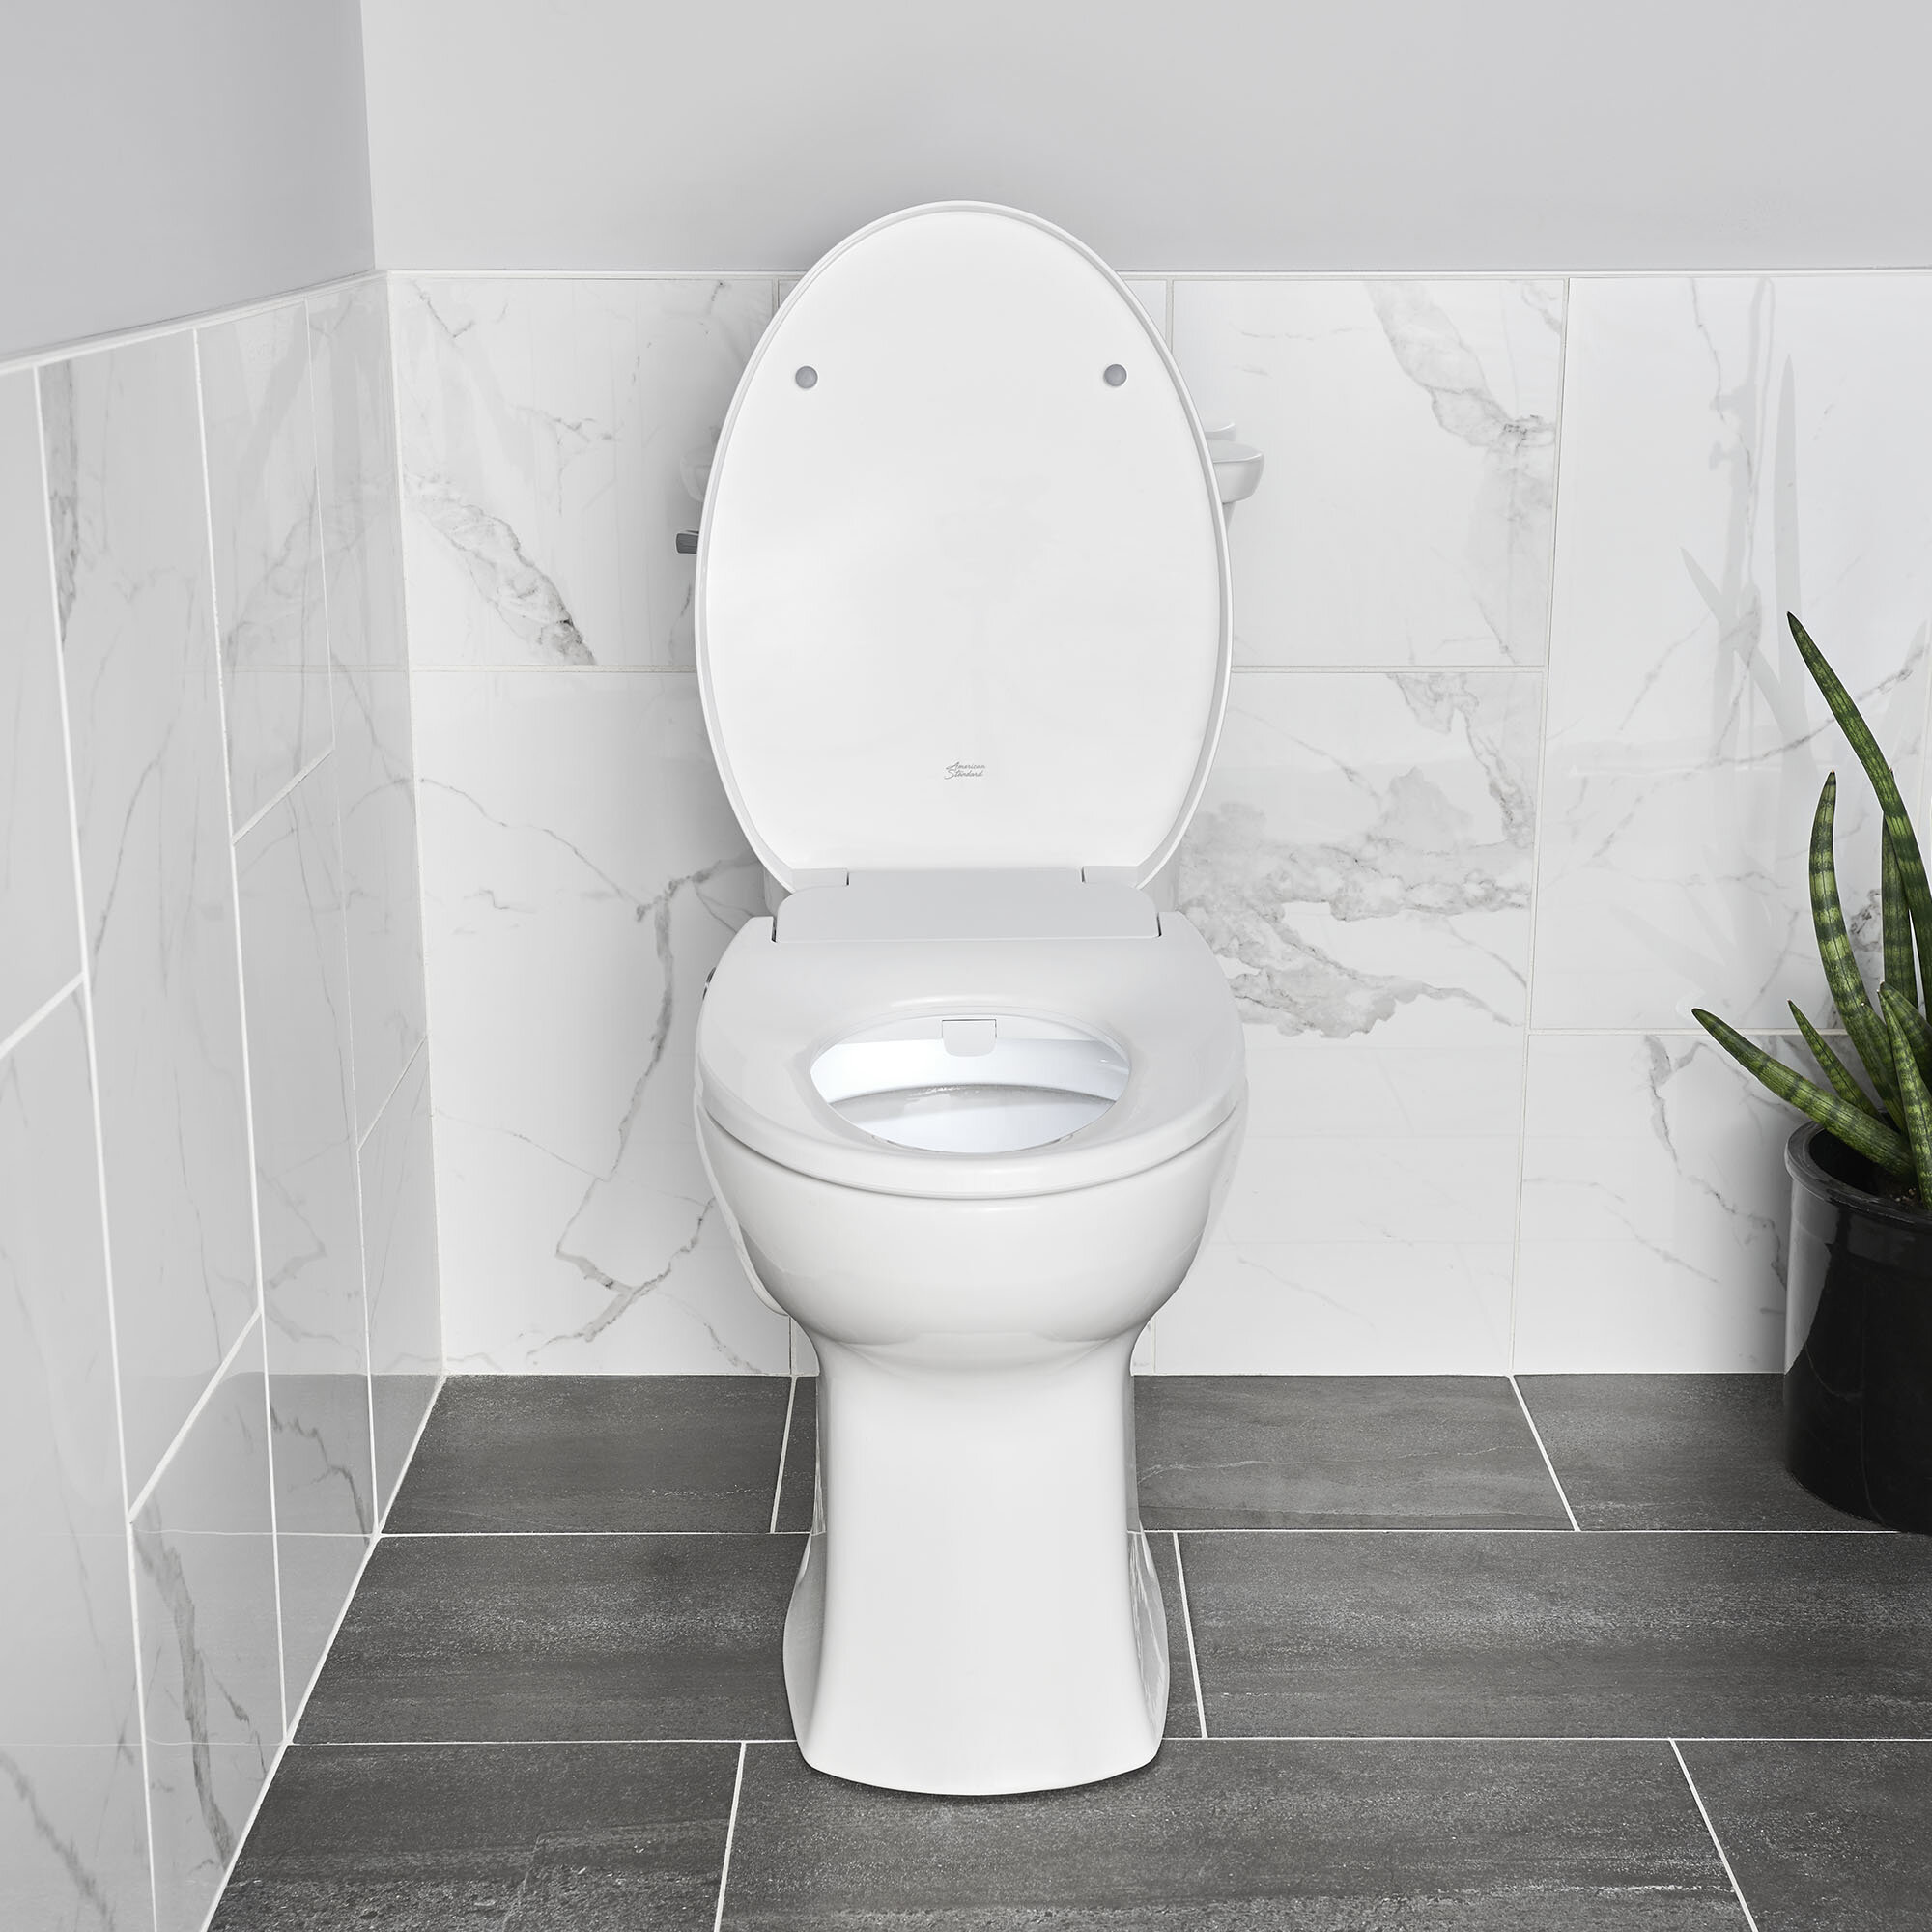 Remarkable Aquawash 2 0 Manual Spalet Elongated Toilet Seat Bidet Cjindustries Chair Design For Home Cjindustriesco